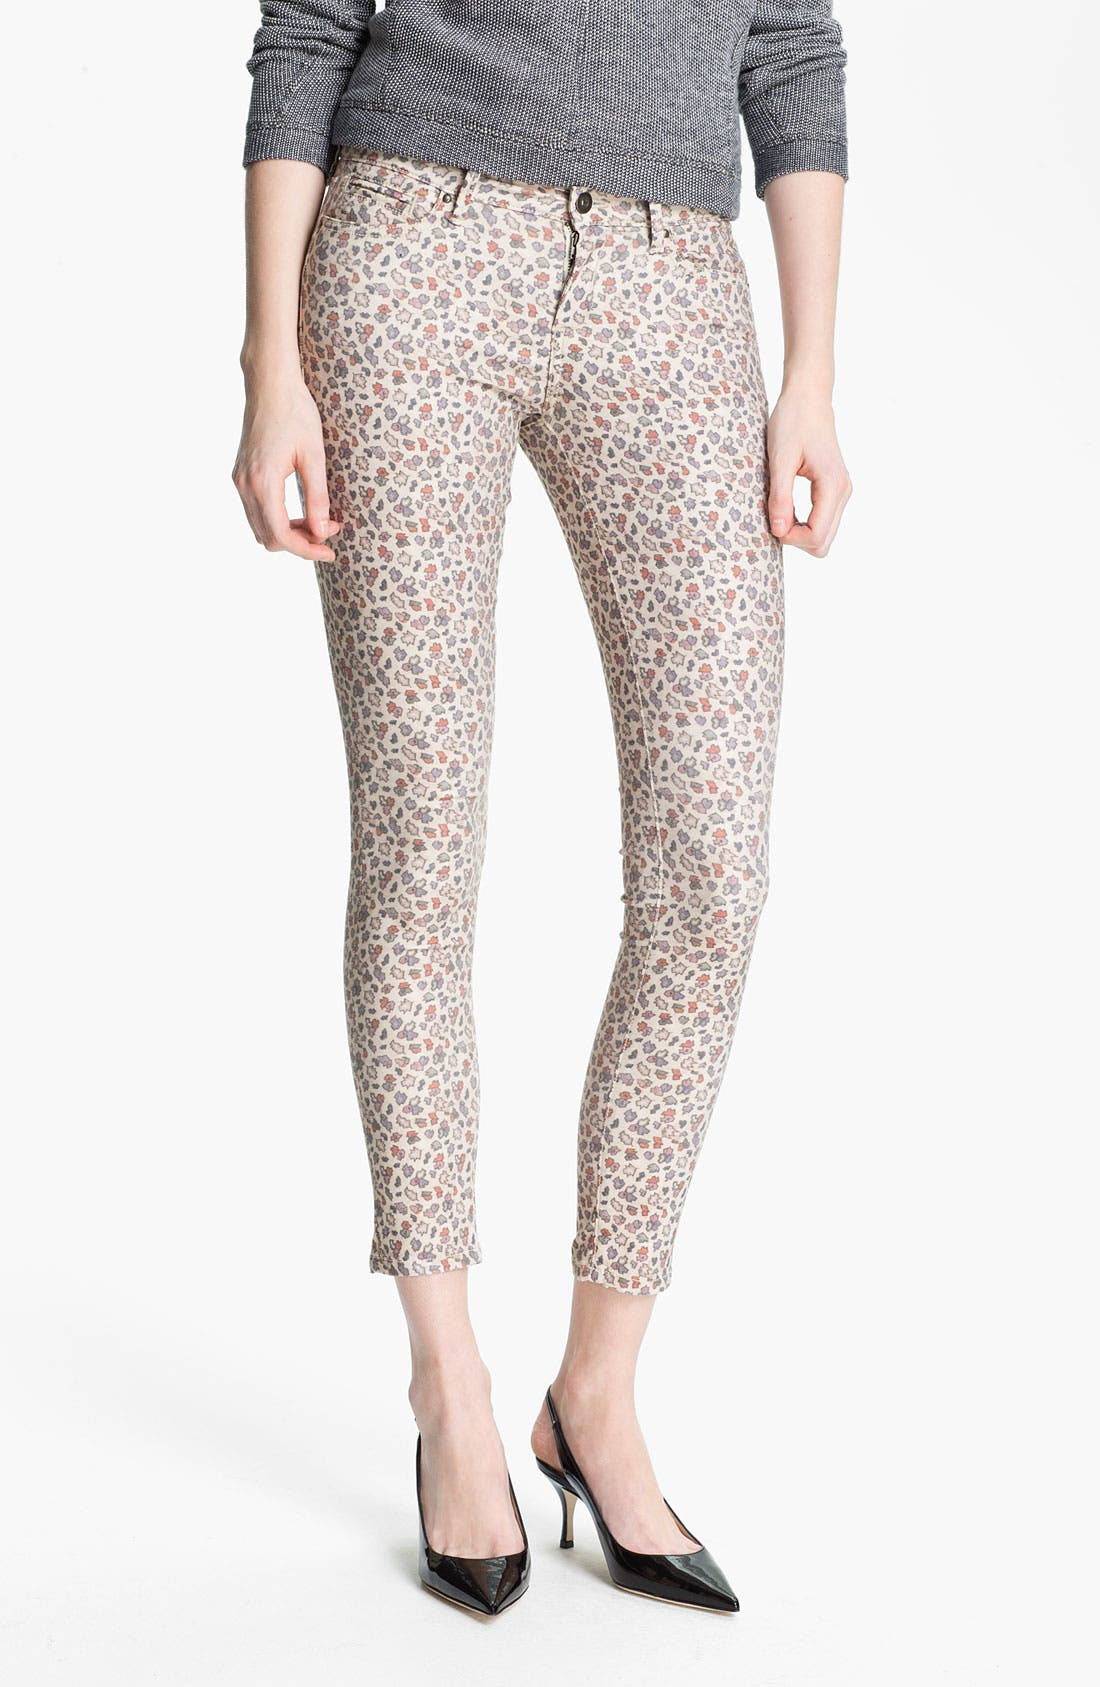 Main Image - Twenty8Twelve 'Ashberry' Skinny Print Stretch Jeans